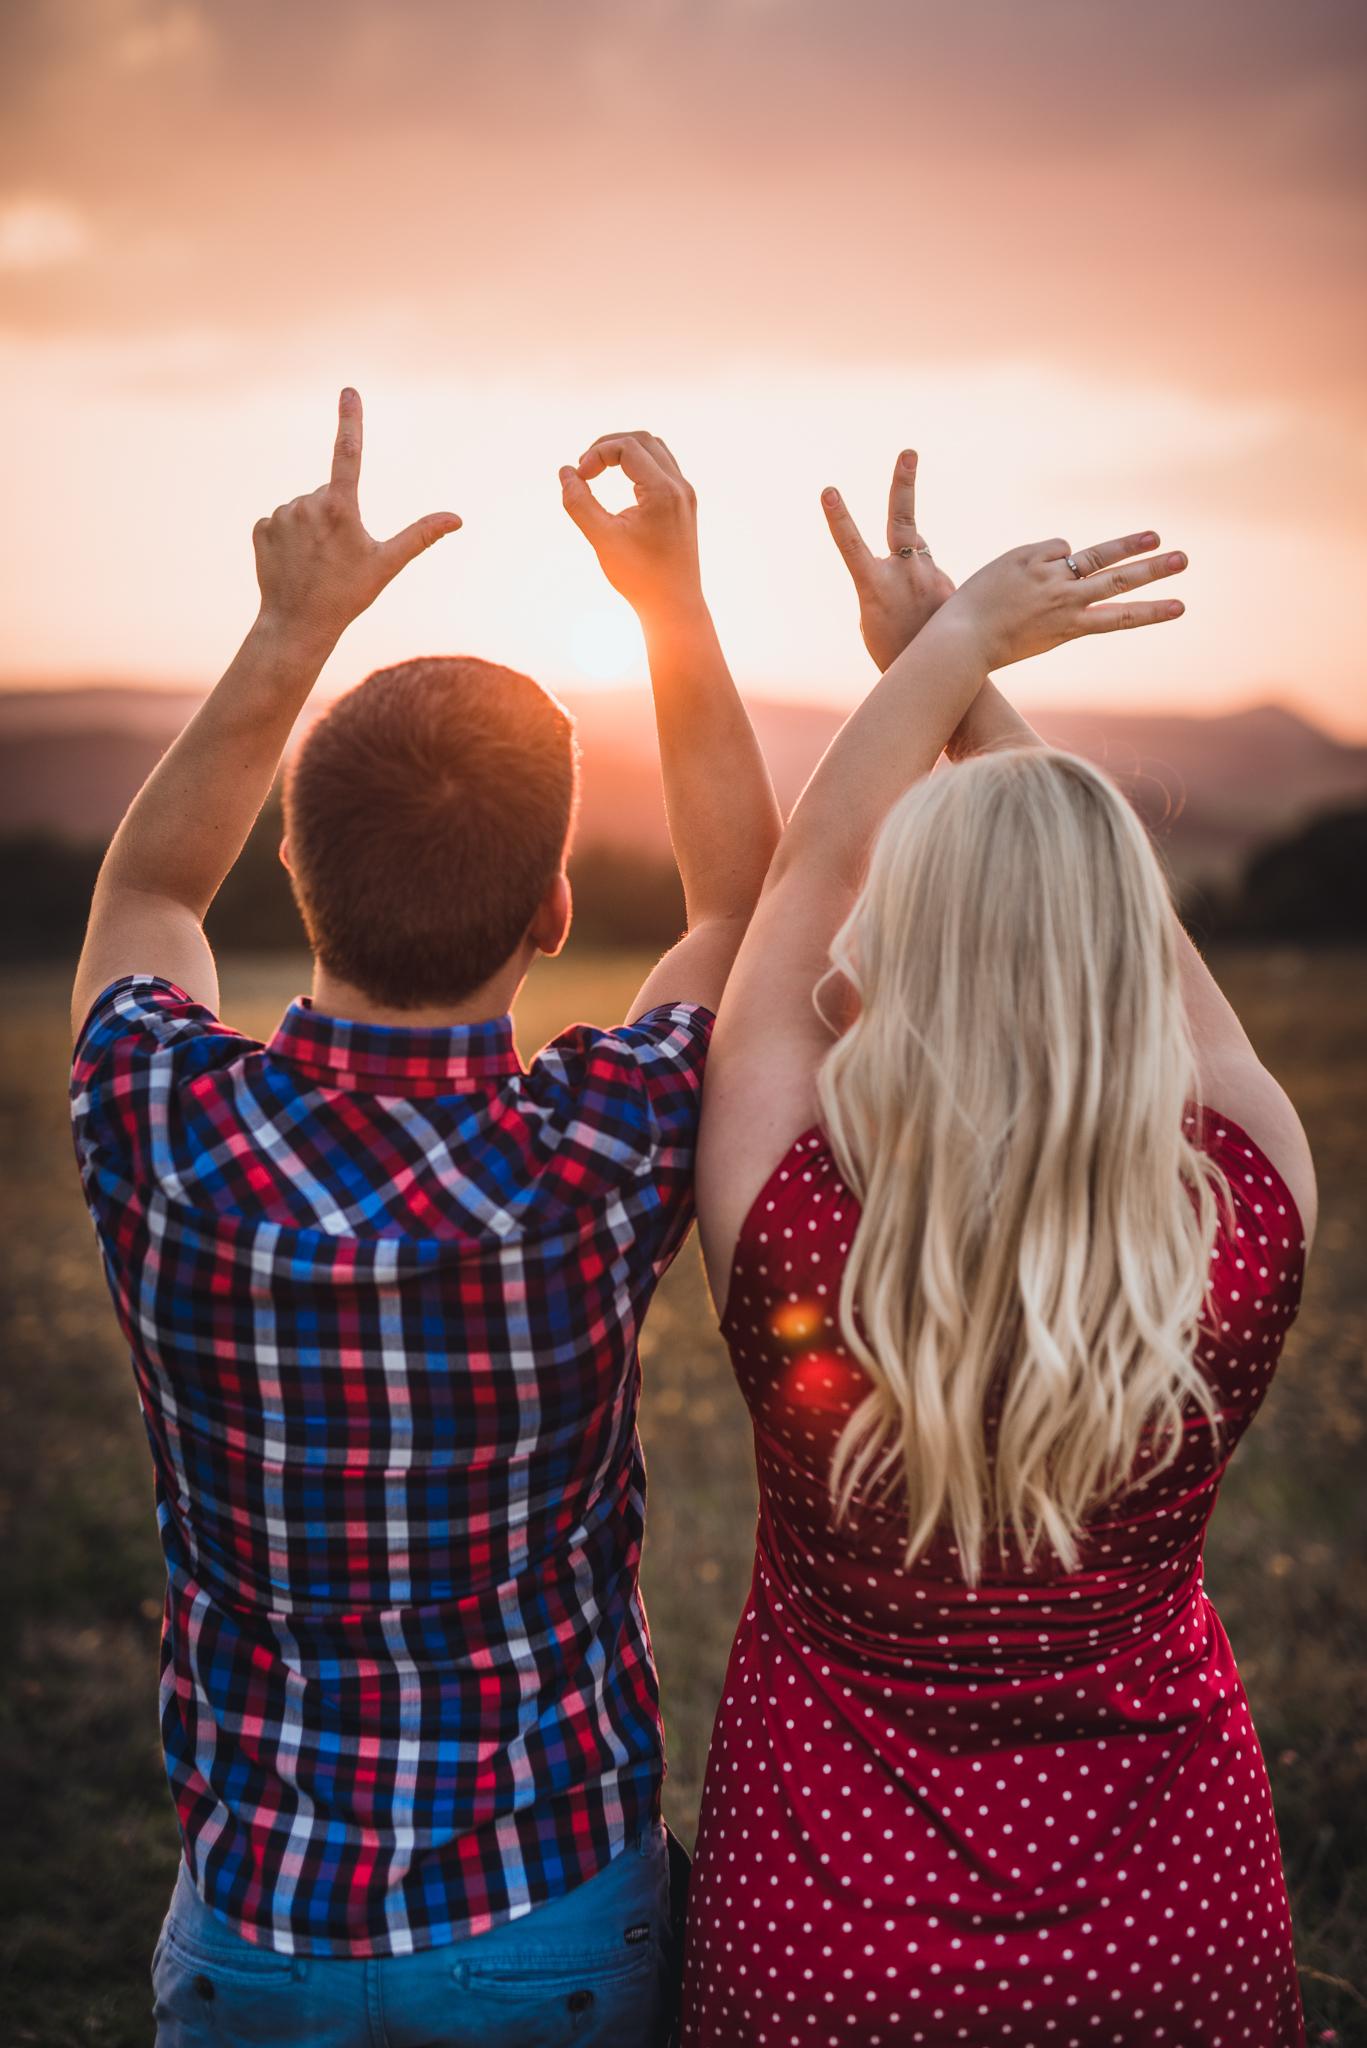 pár, láska, západ slnka, love, ruky, romantika, Bratislava